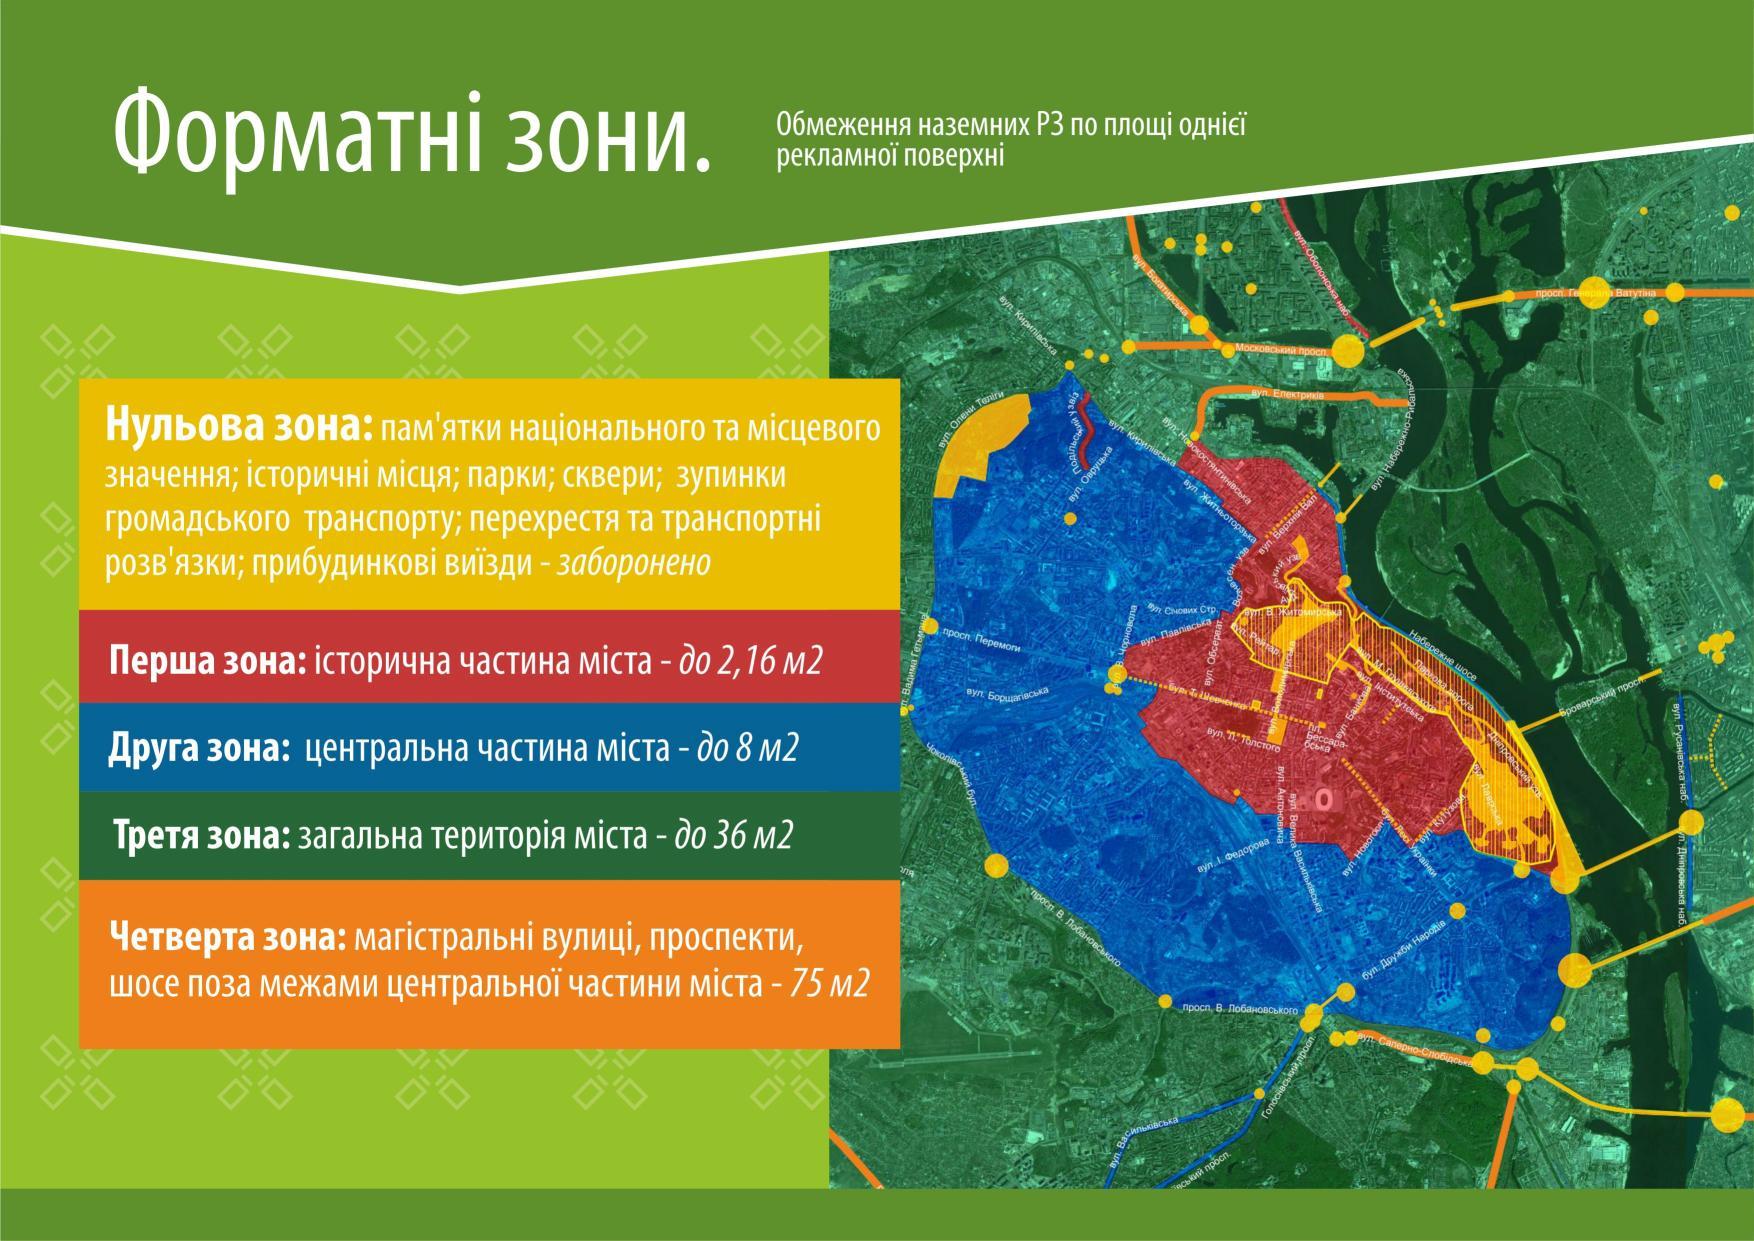 Форматні зони Києва